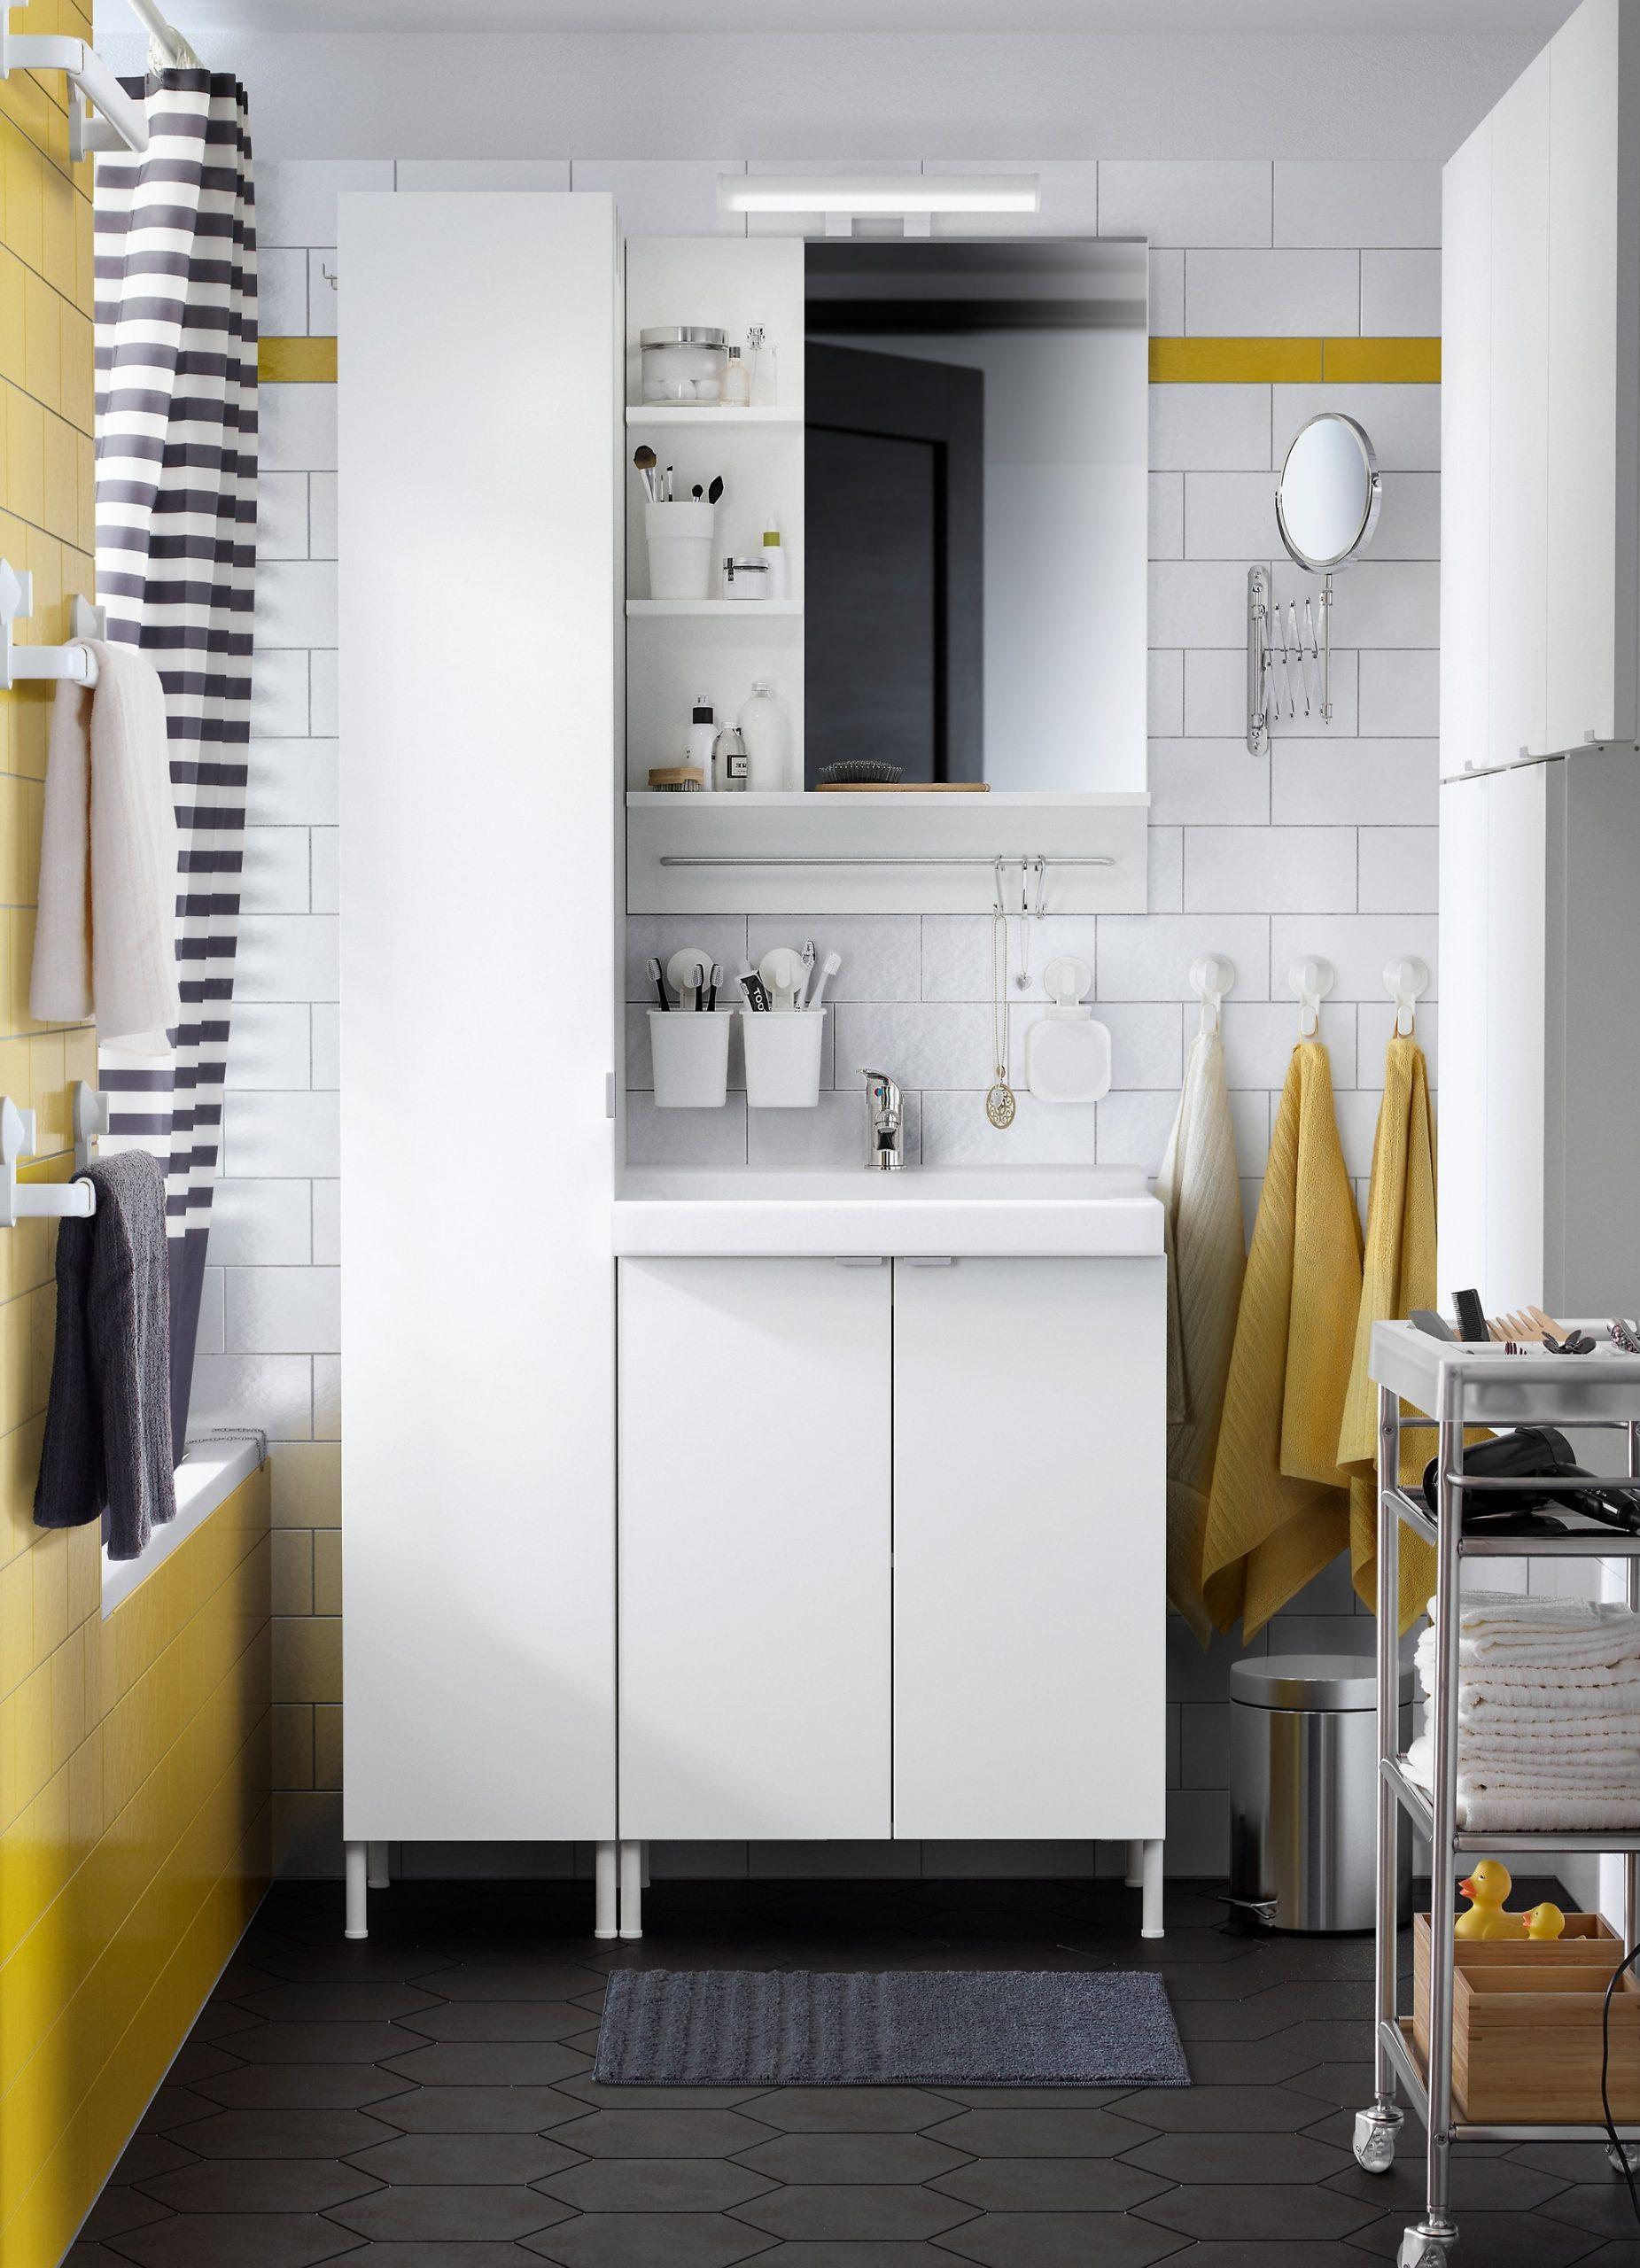 Under Sink Cabinet Wickes Patio Ideas